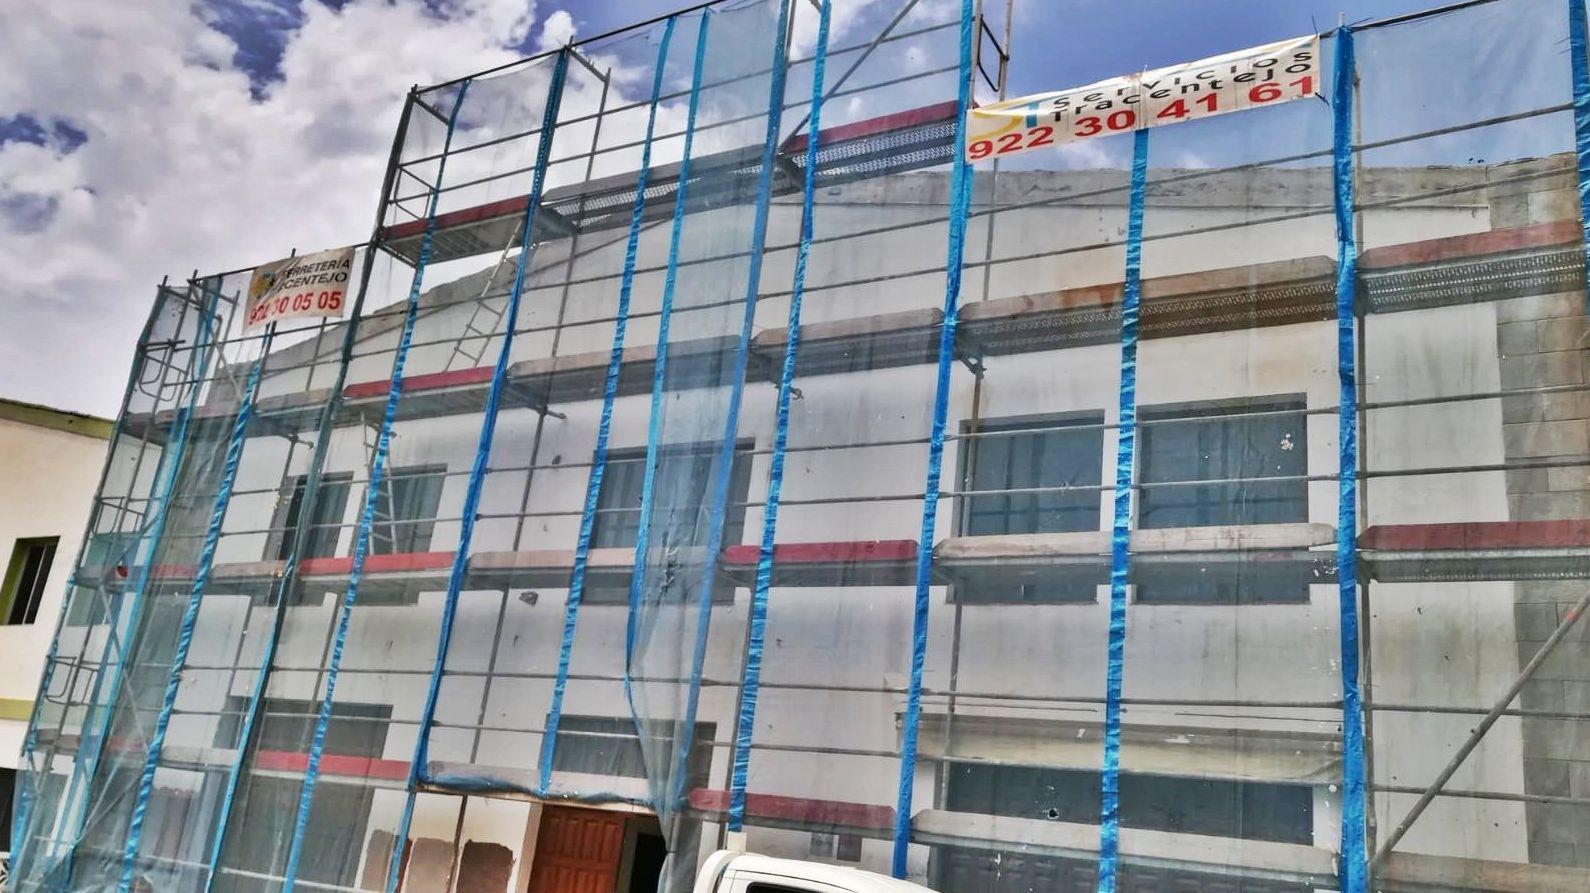 Andamio Super para rehabilitación de fachada. Polígono San Jerónimo. La Orotava.